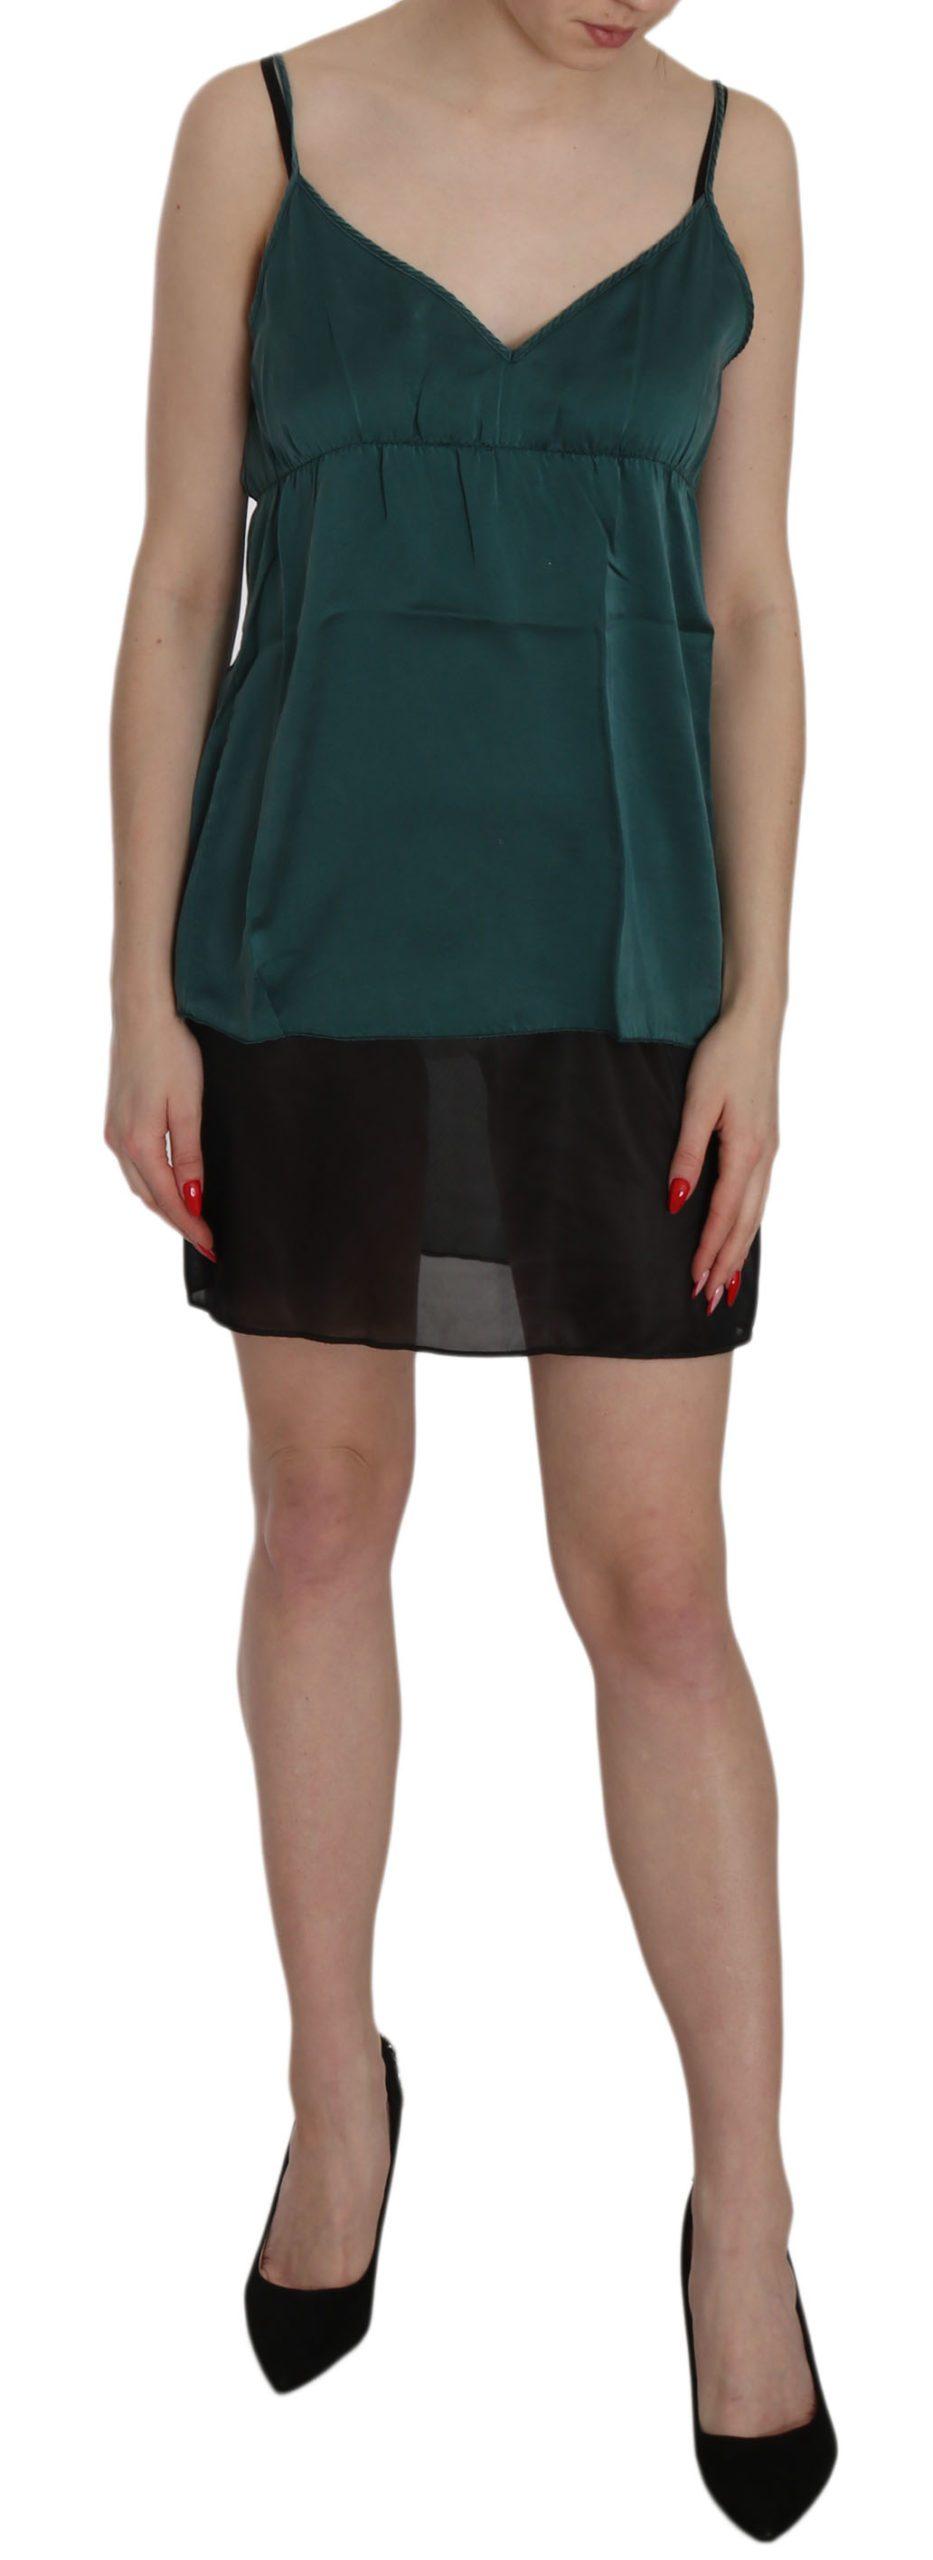 PINK MEMORIES Women's Silk Spaghetti Strap Shift Mini Dress Green TSH3471 - IT40 S